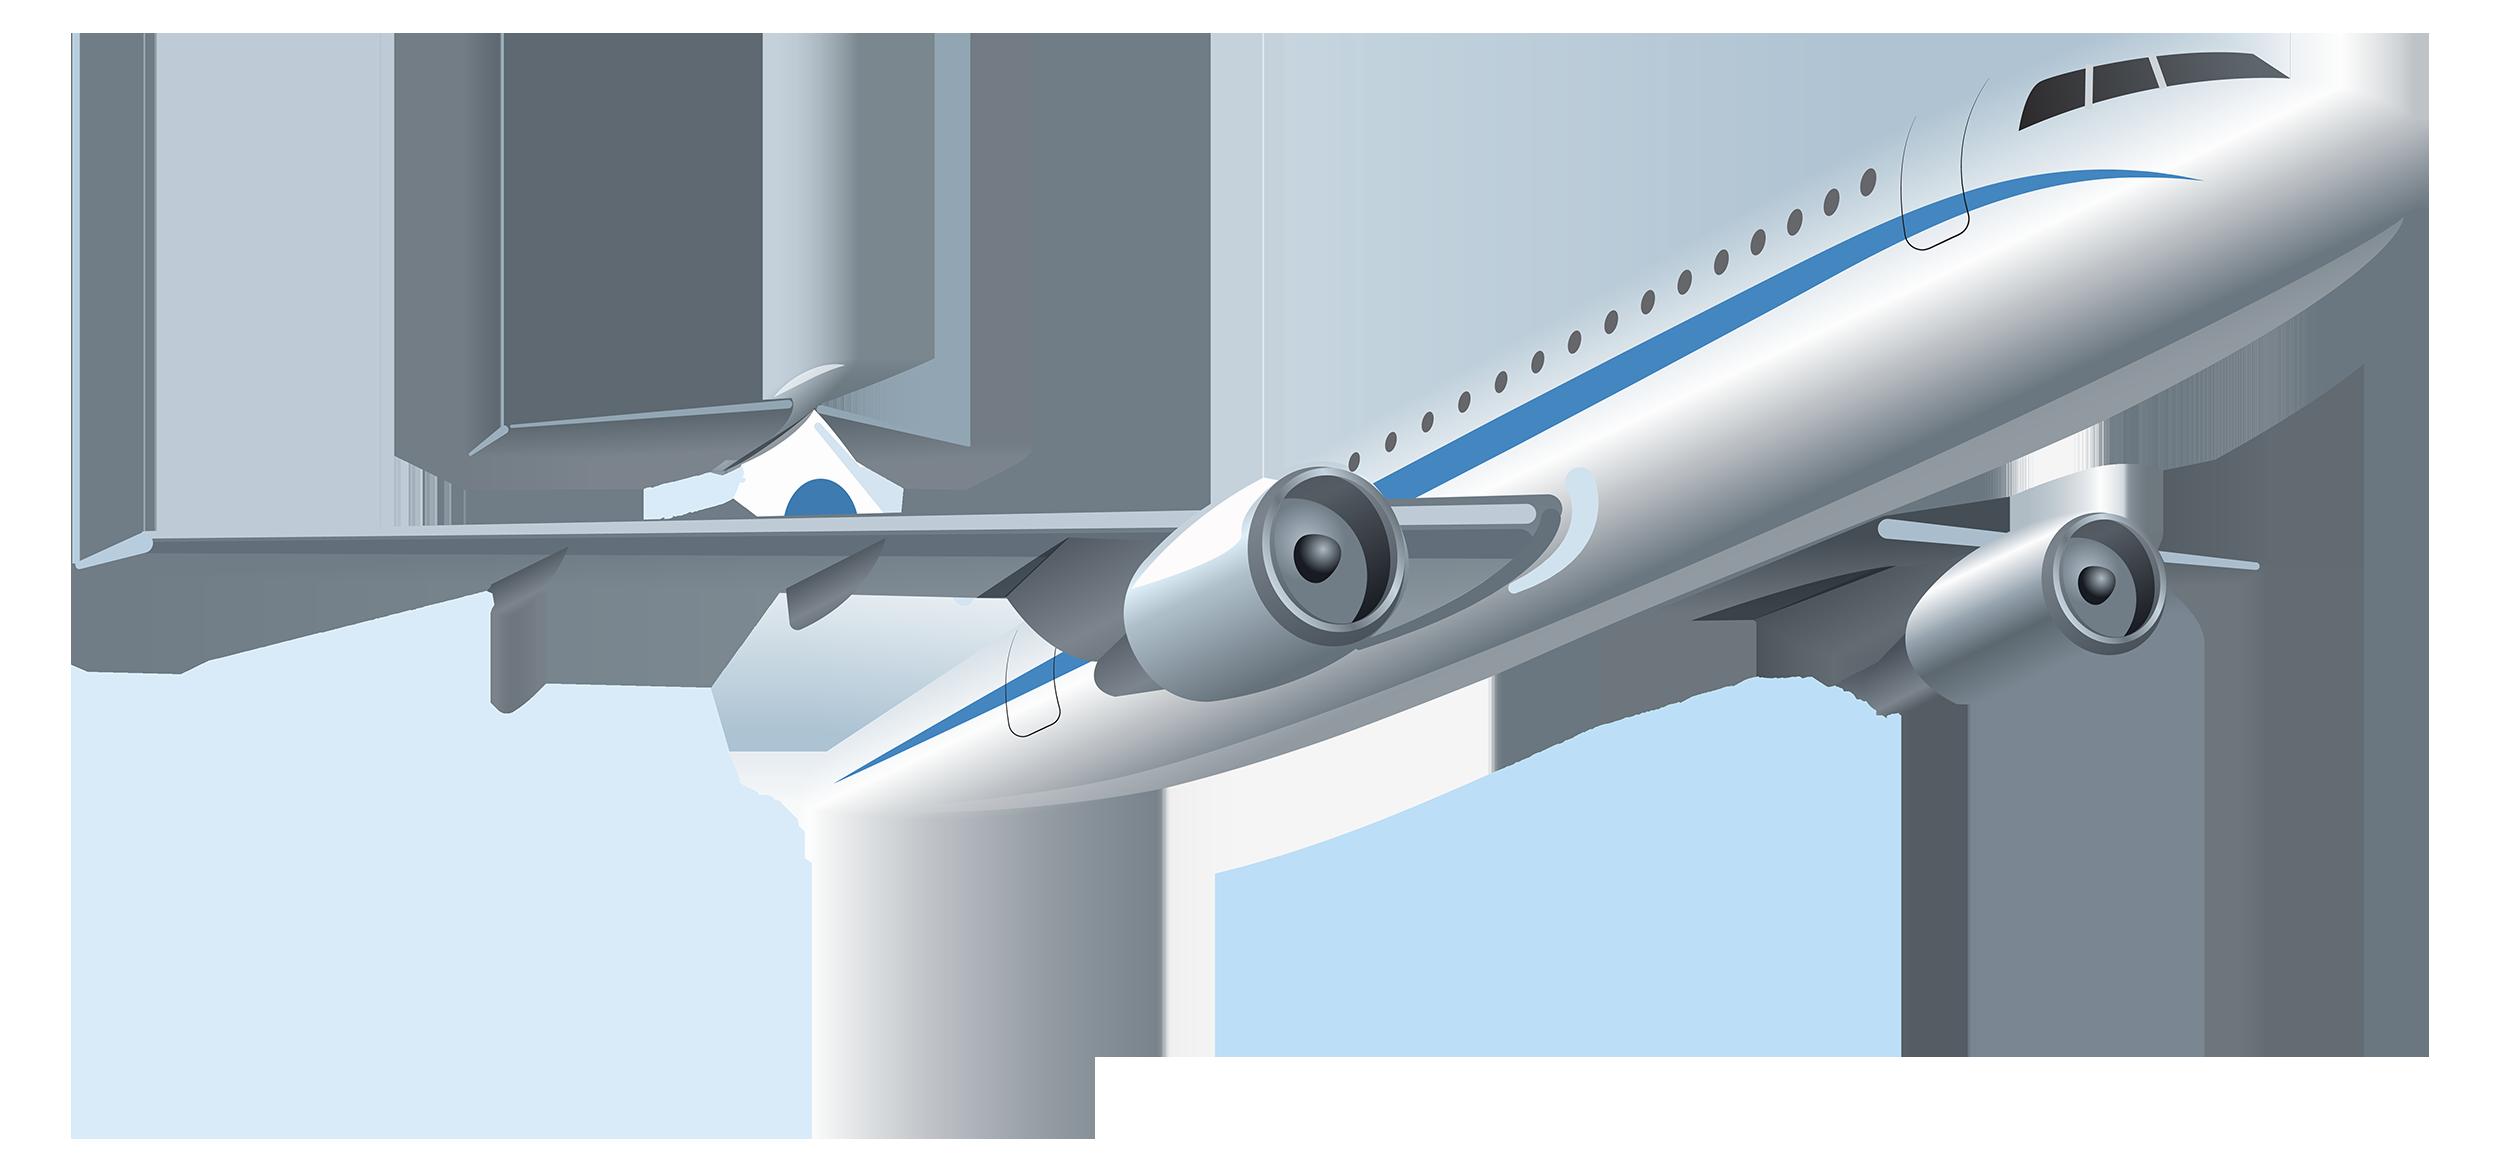 Drawn aircraft transparent background #12